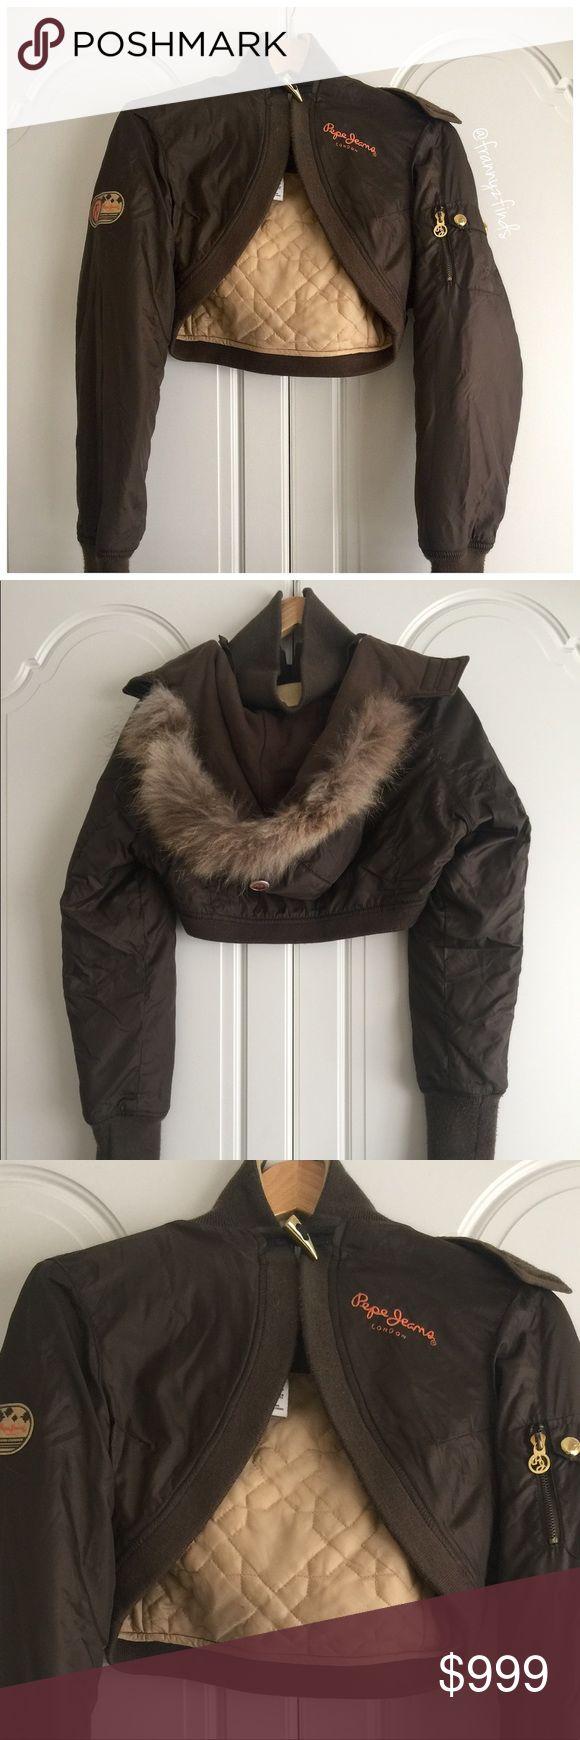 • london find II • pepe london • crop • detachable hood • faux fur hood trim • gold hardware • single toogle closure Pepe Jeans Jackets & Coats